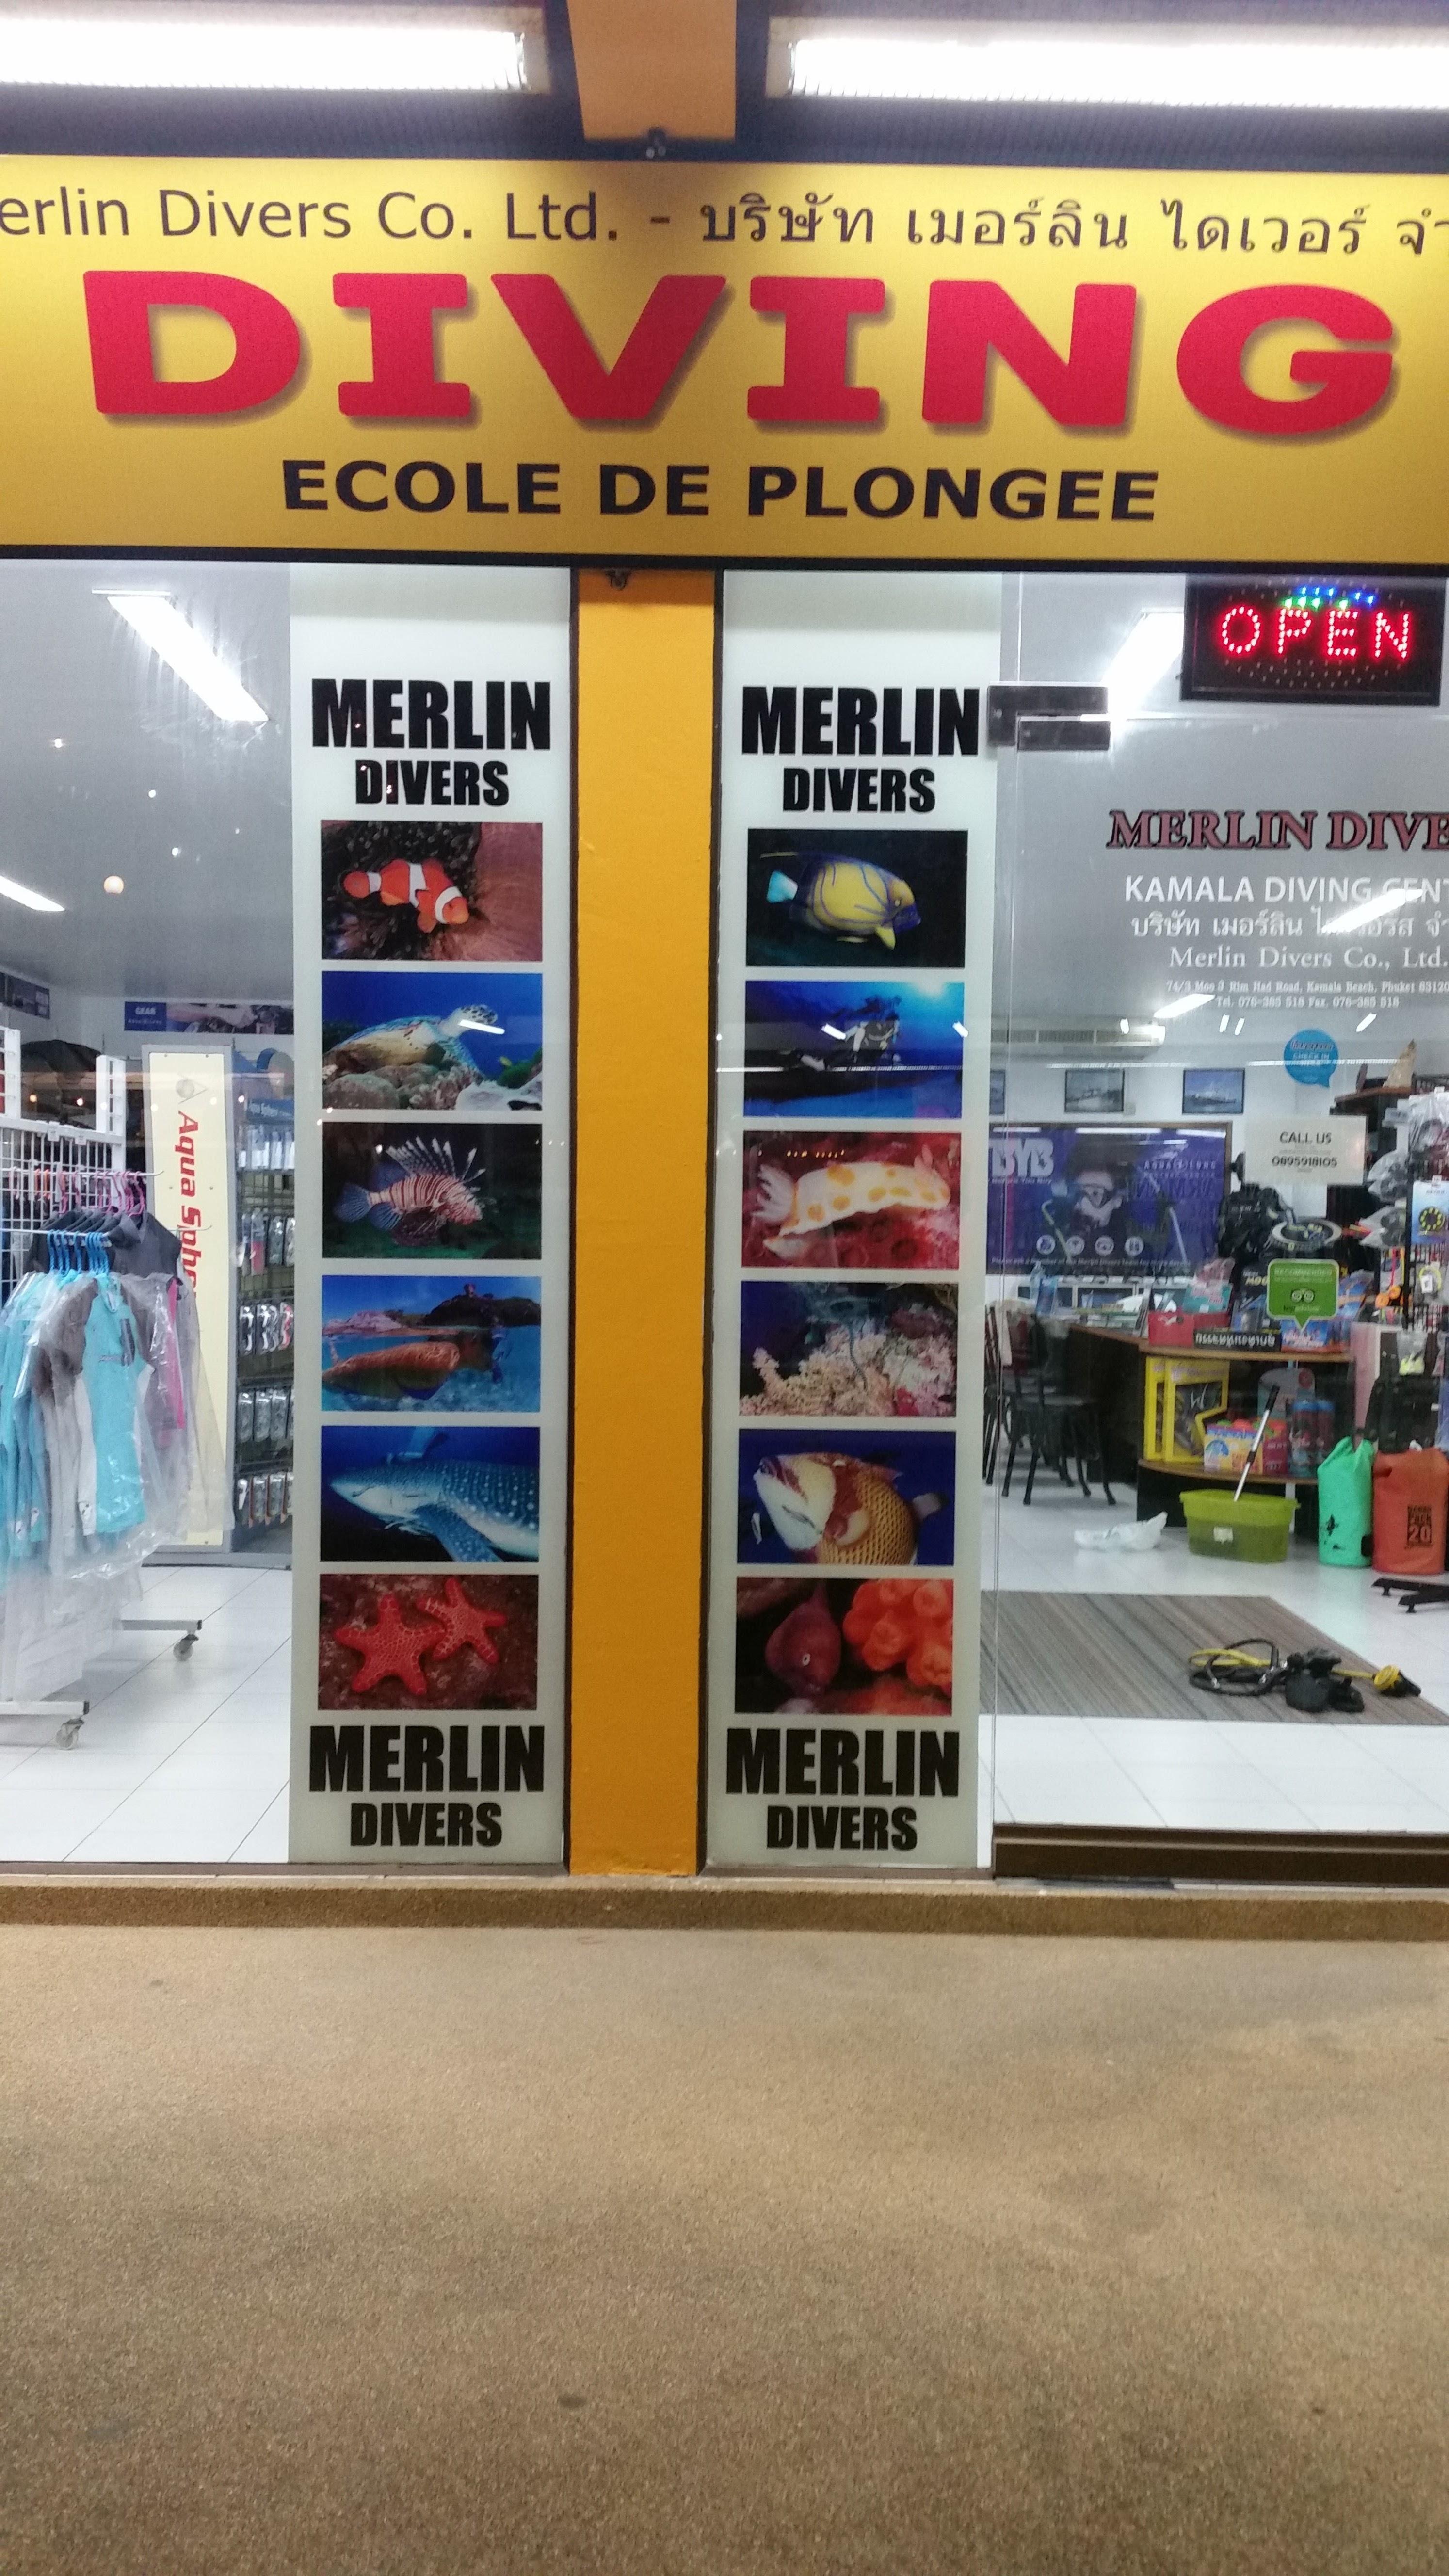 10 years +Merlin Divers Co., Ltd. | Scuba Diving Phuket - face-lift and rebor...